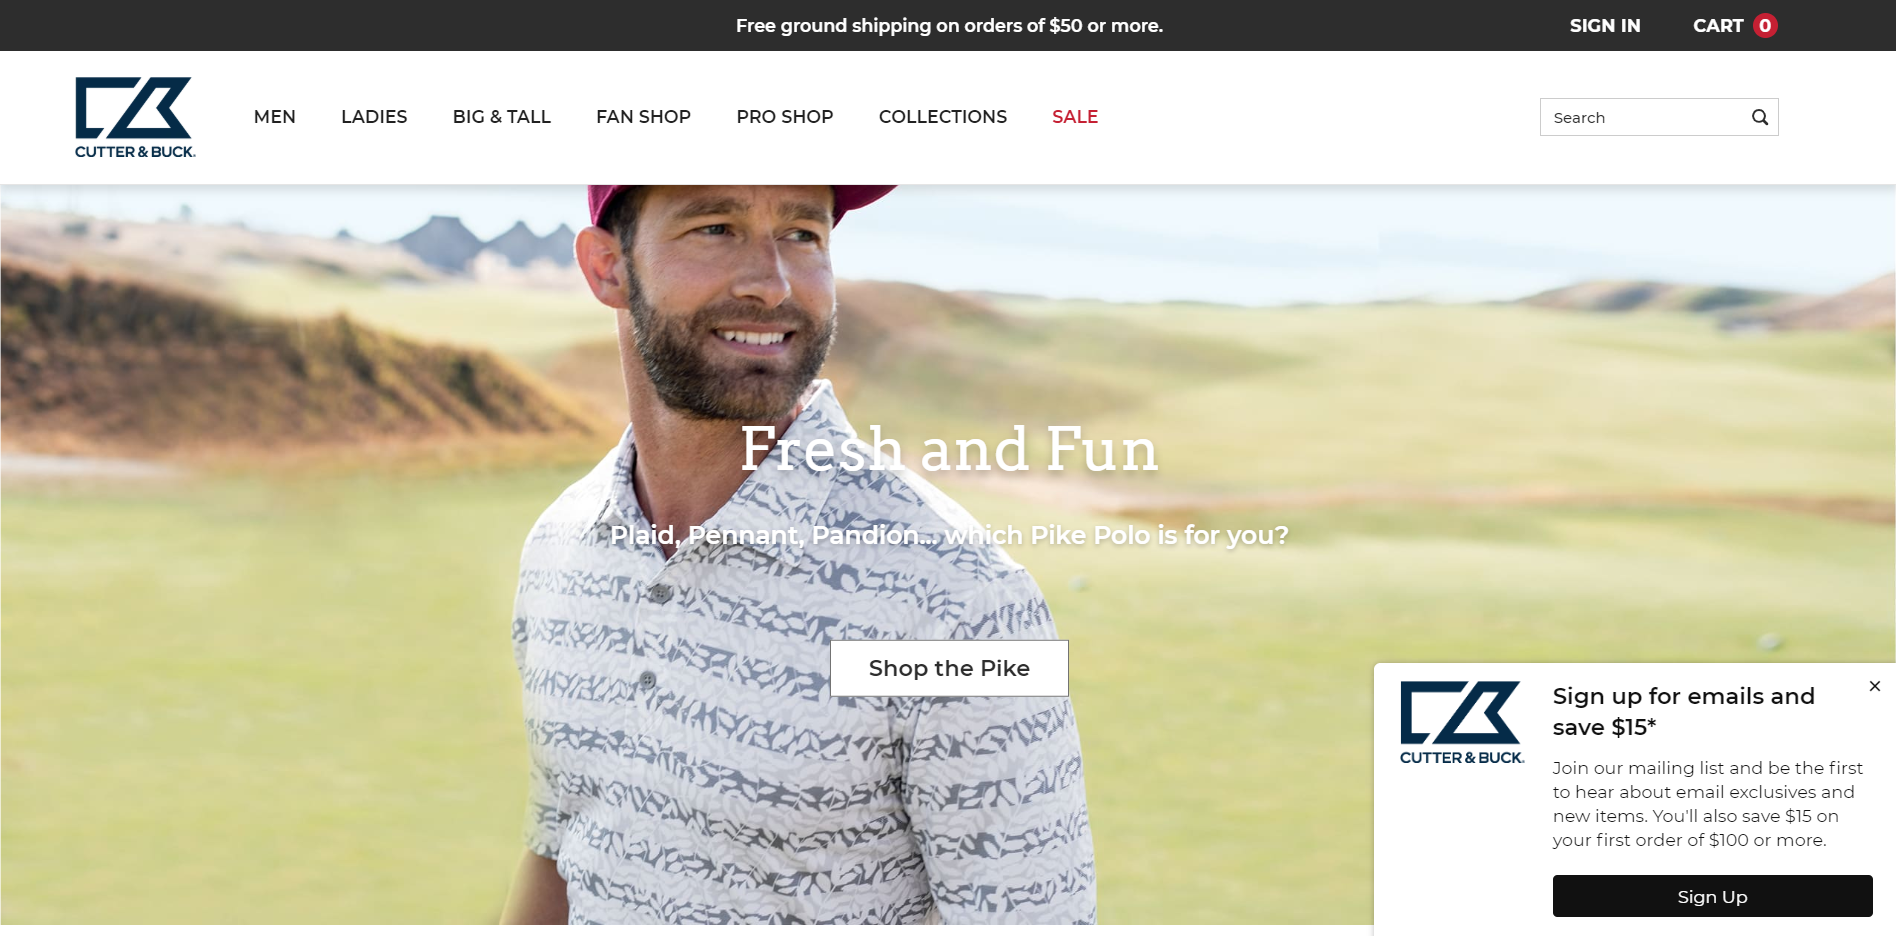 eCommerce Home Page Best Practices: Cutter & Buck Unique Value Proposition